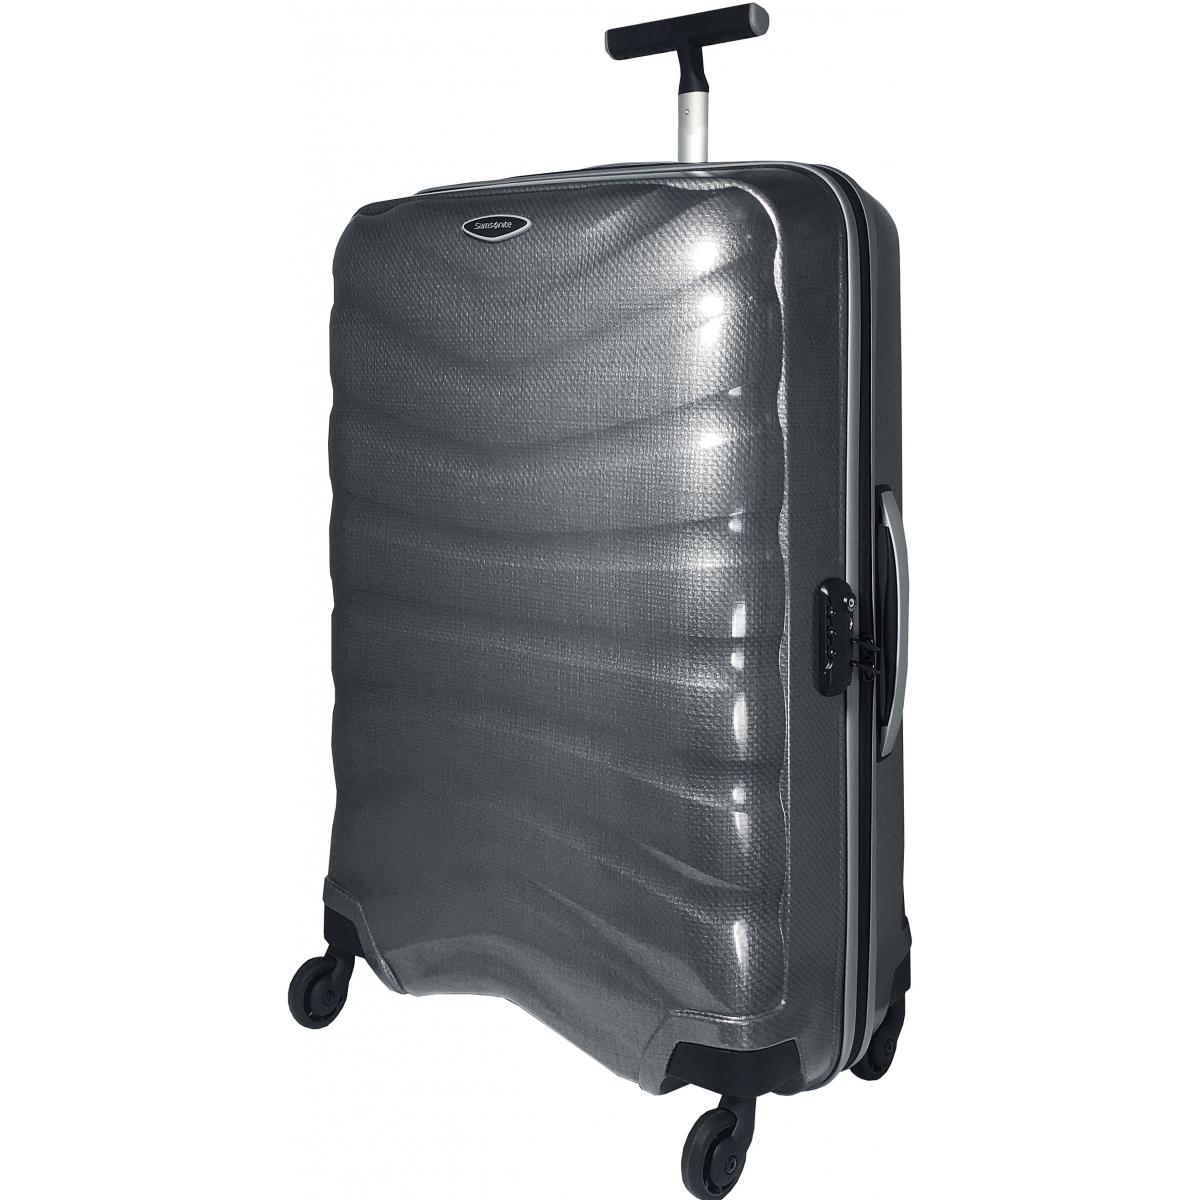 valise samsonite firelite spinner 81 cm taille xl gris firelite84 couleur principale. Black Bedroom Furniture Sets. Home Design Ideas